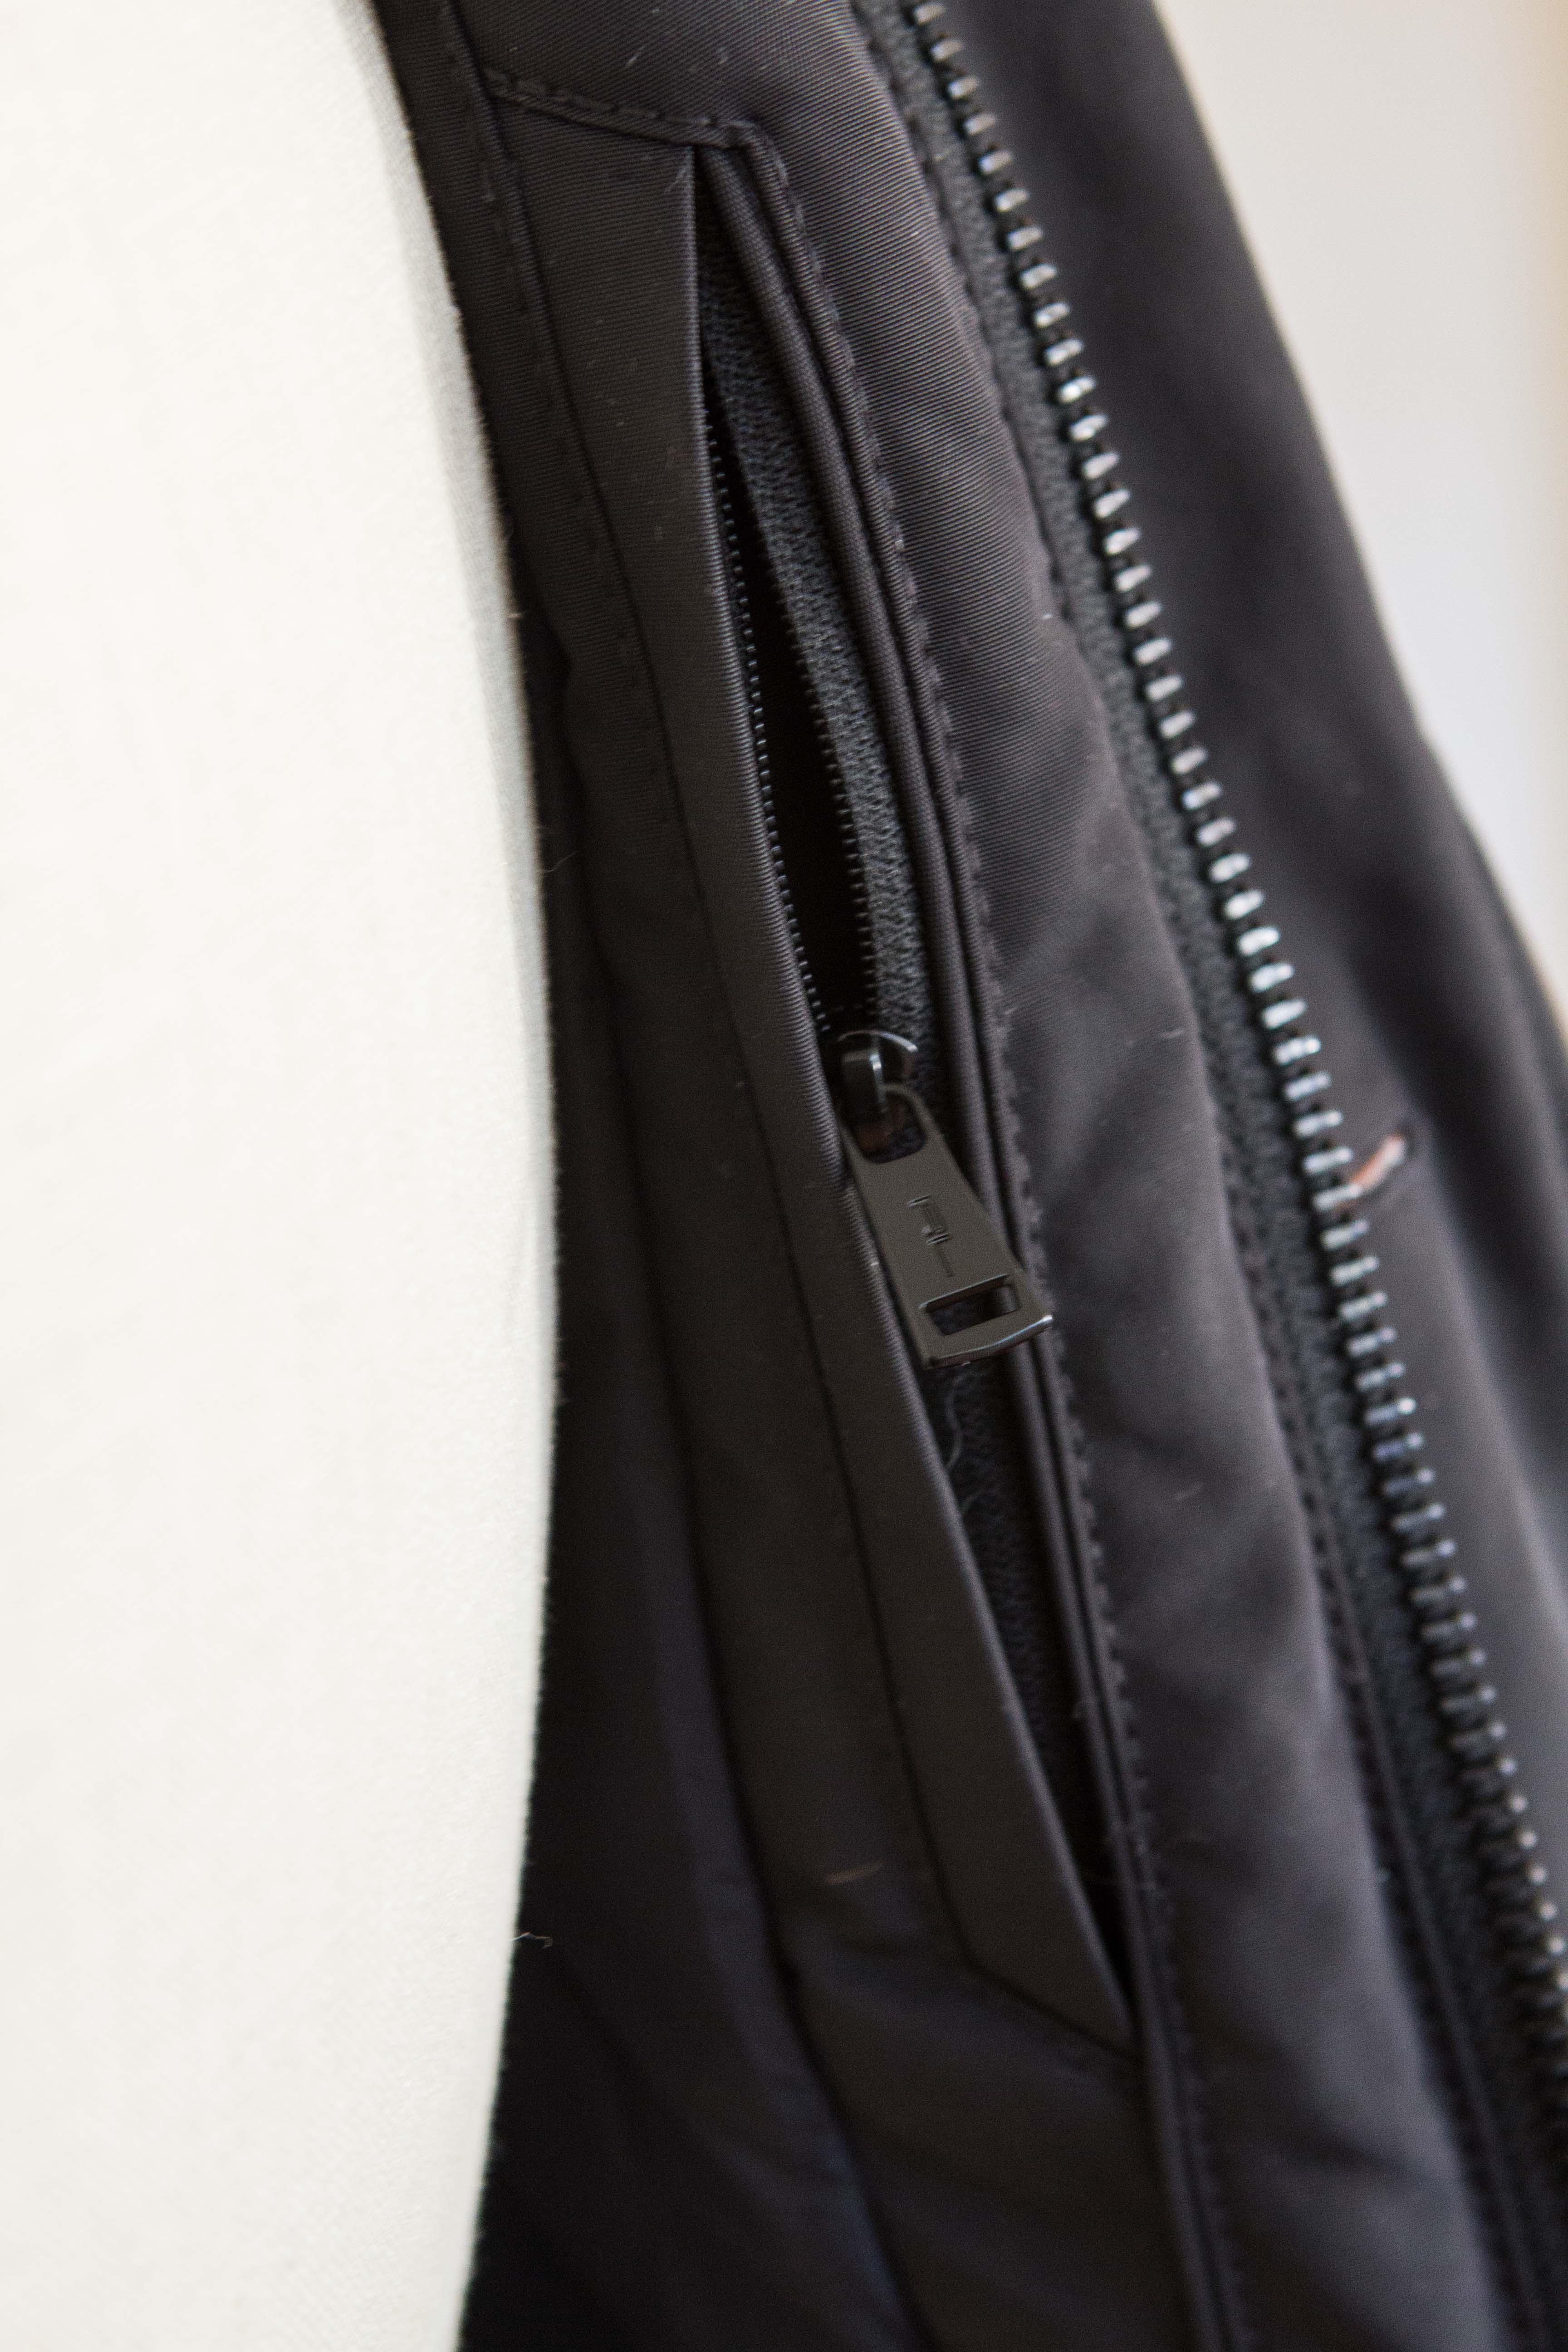 Military sc-lined-jacket - 05.jpg